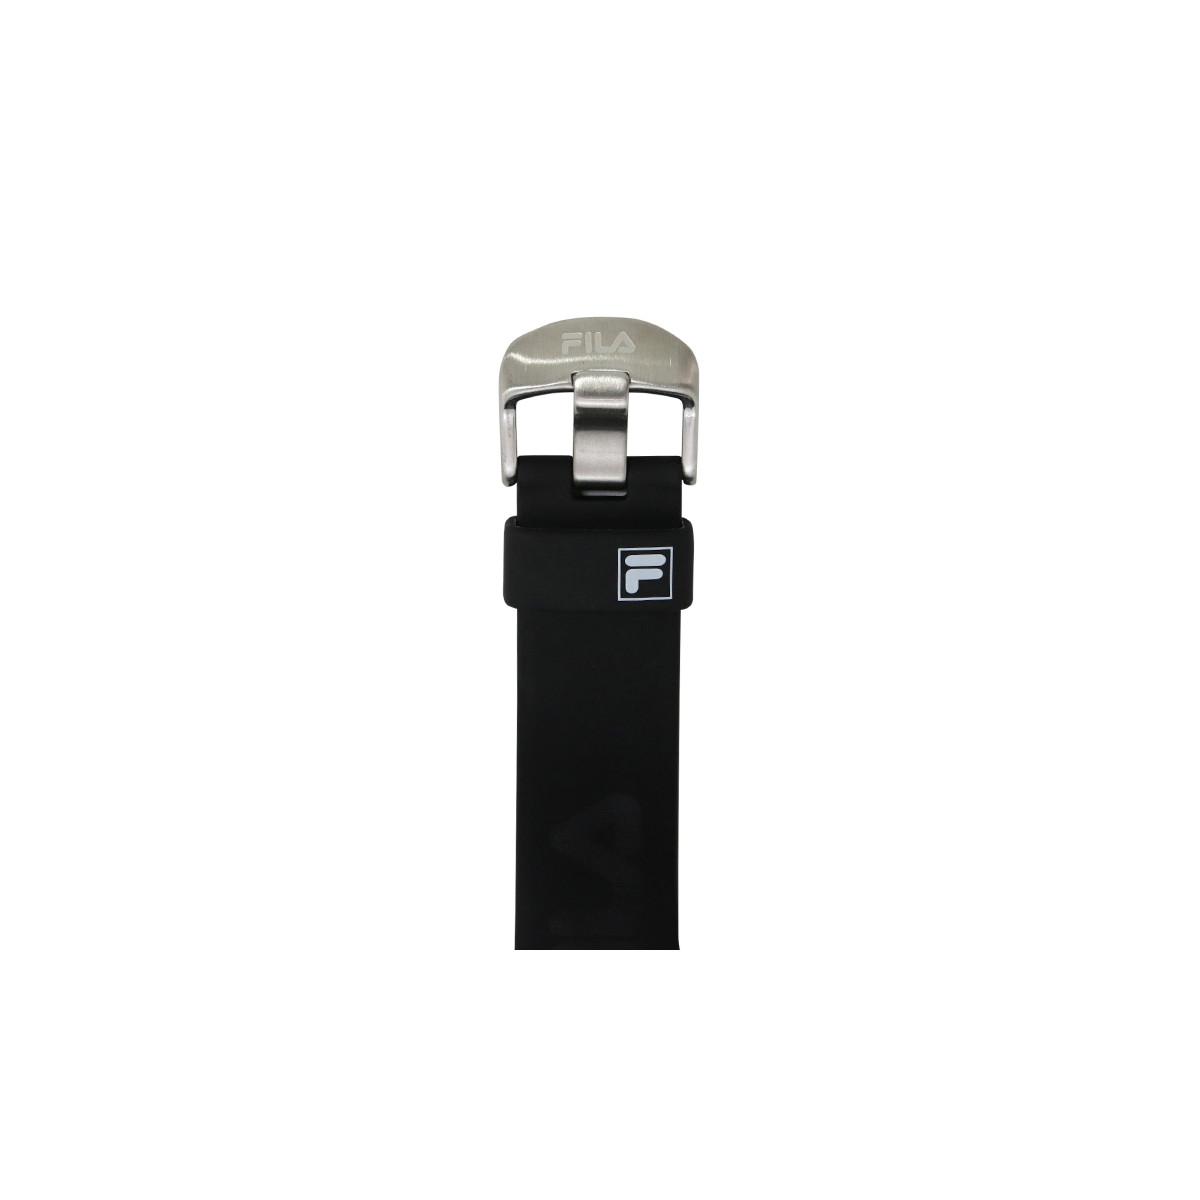 Montre mixte FILA cadran noir - 38-160-004